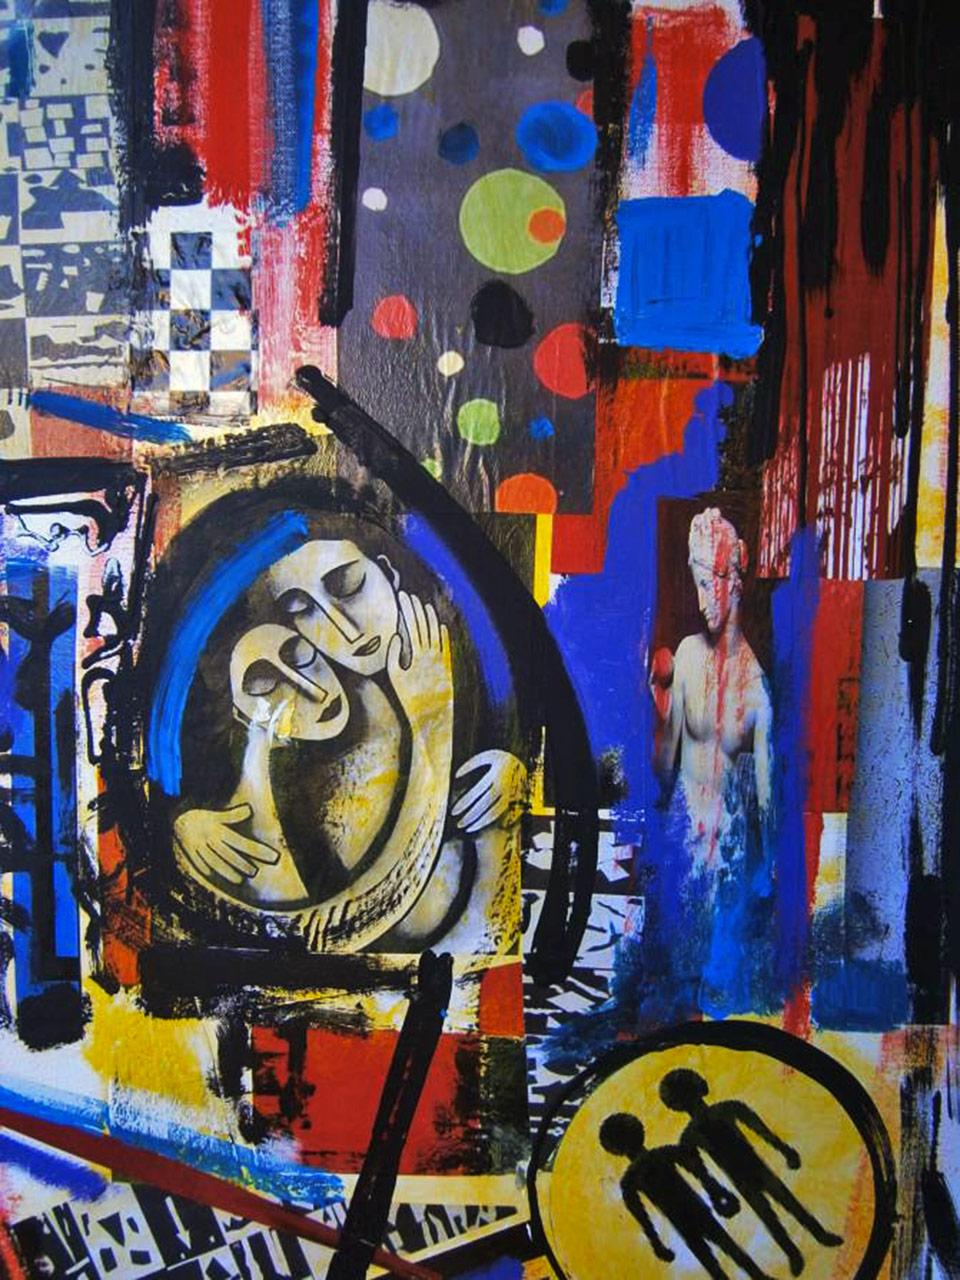 Poveri Amanti (Poor Lovers) - tecnica mista su tela cm 60 x 80 anno 2015